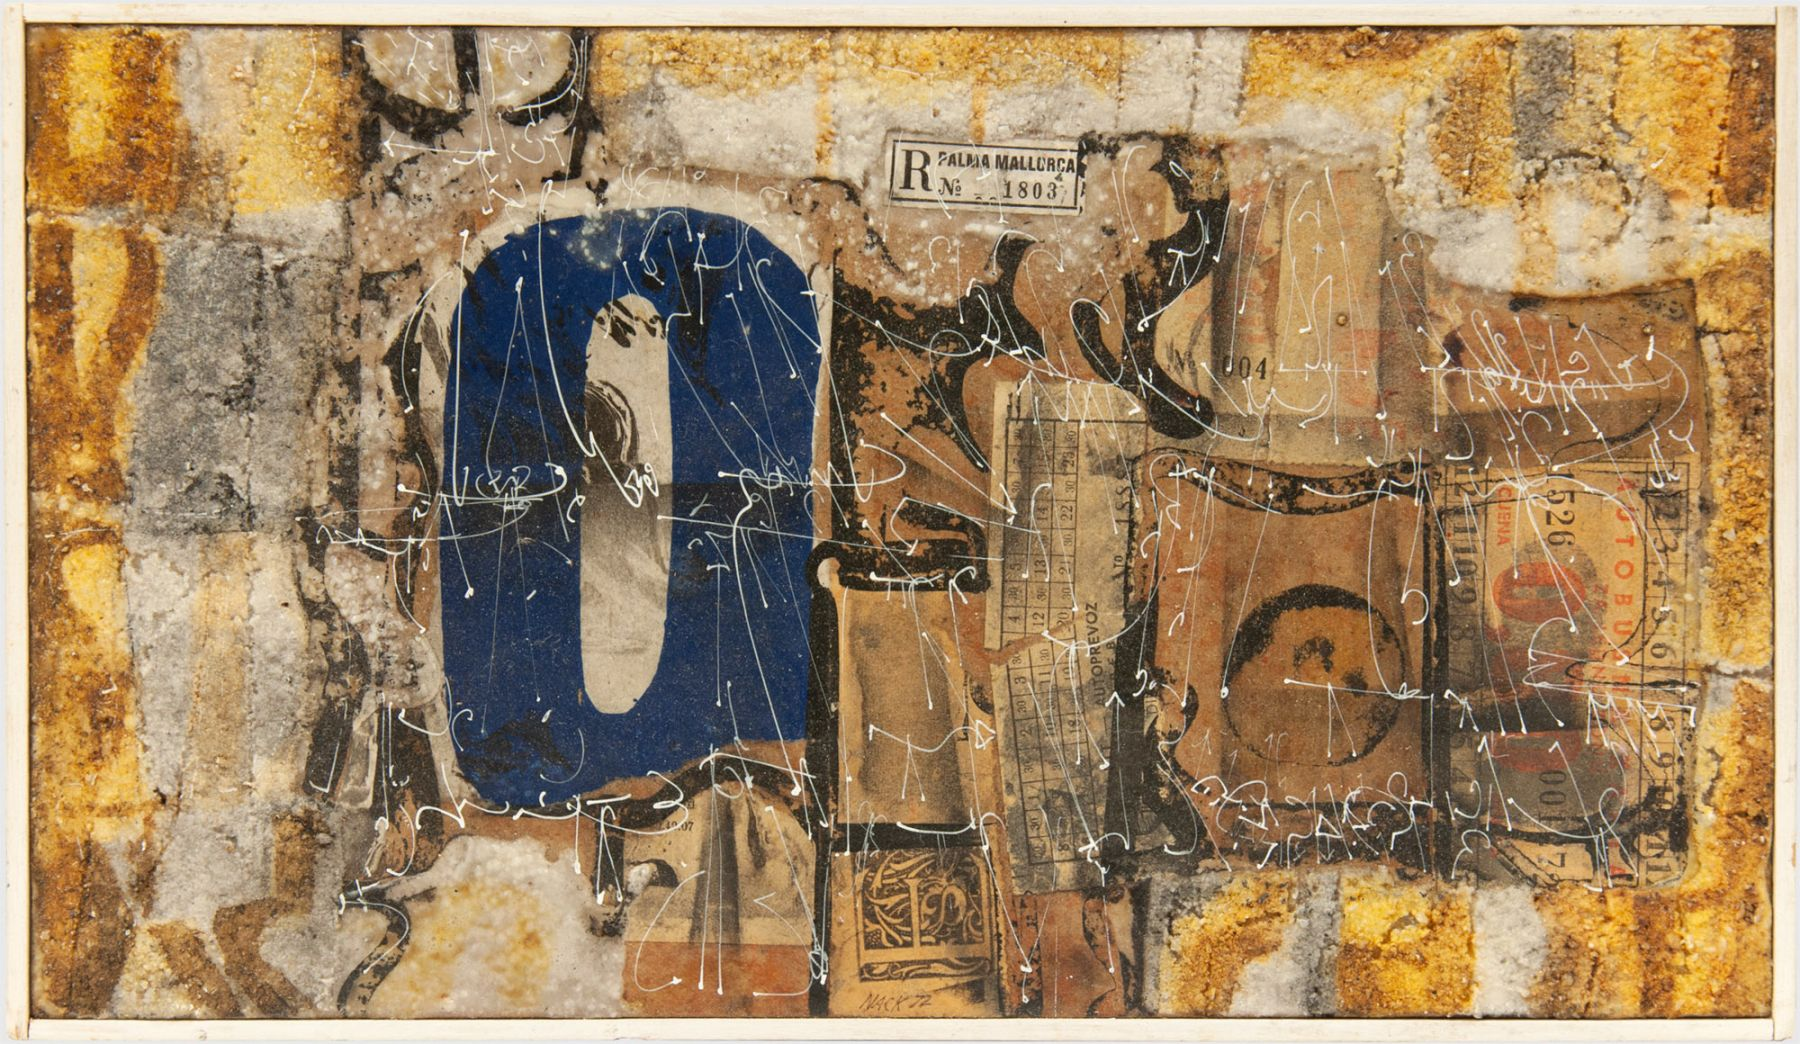 KEN NACK (1923-2009), Riva del Fero, 1971-72